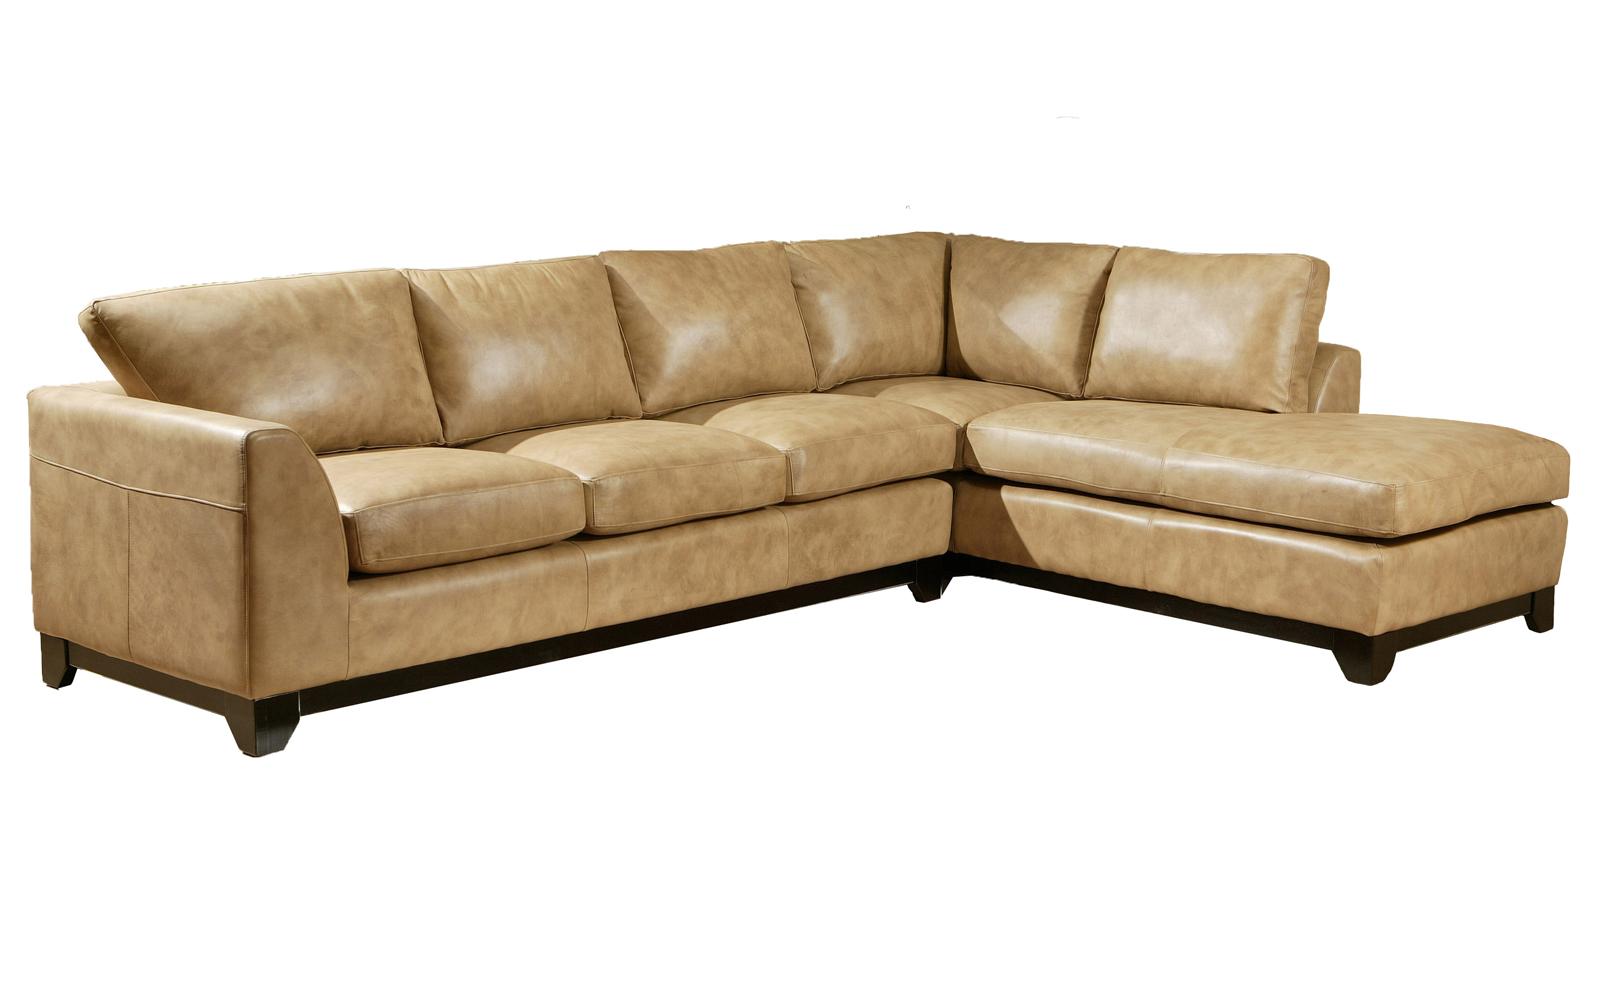 Catnapper Sleeper Sofa Omnia Furniture City Sleek Sofa   Broadway Furniture